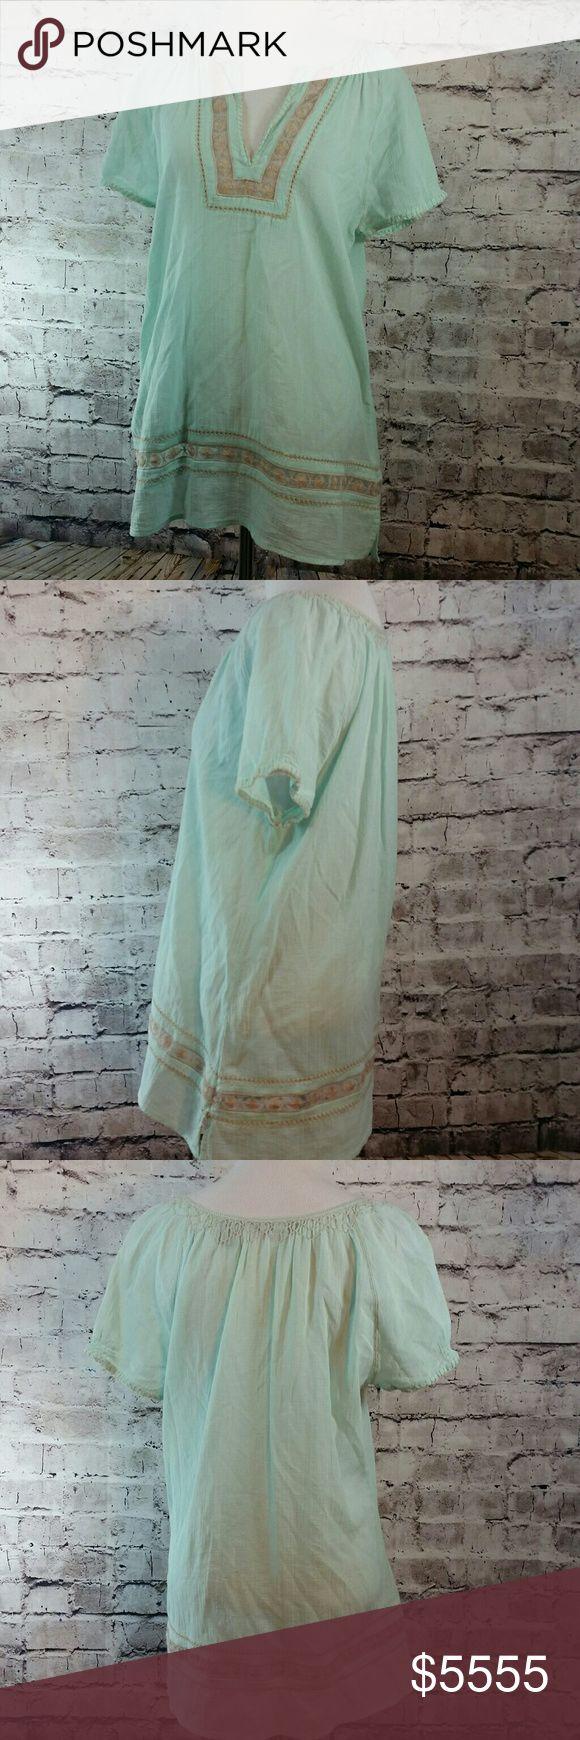 Pretty mint gauzy boho festival blouse Pretty mint gauzy boho festival blouse. No holes tears or stains. Eddie Bauer Tops Blouses